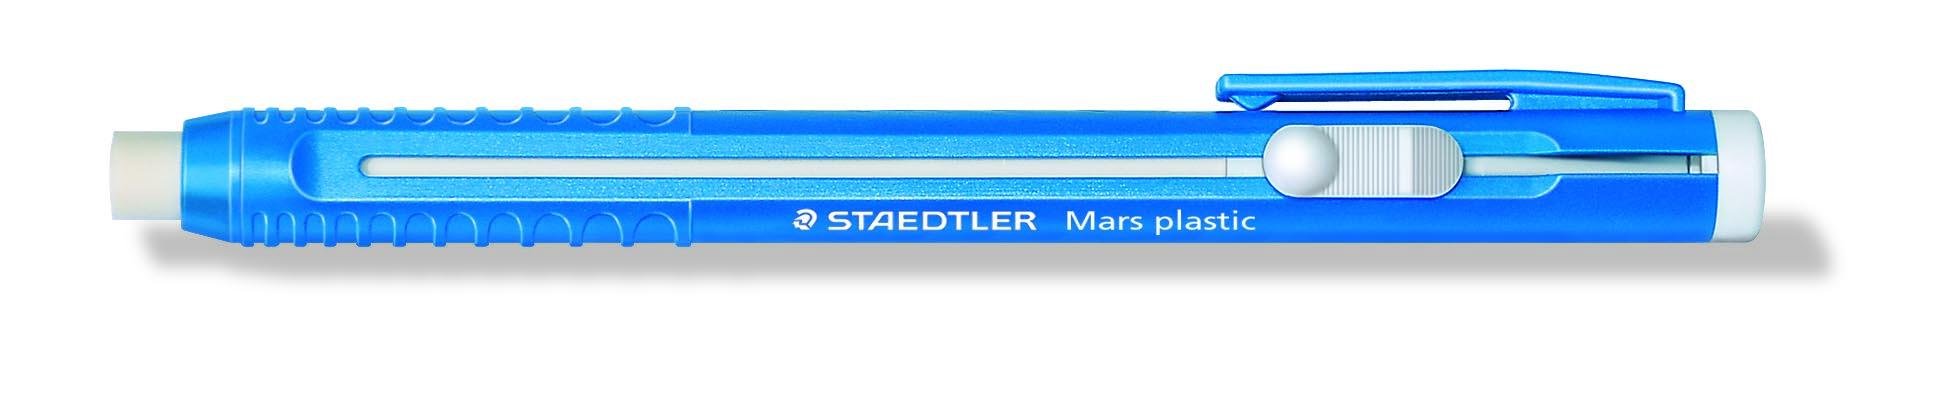 STAEDTLER Viskelærpenn Mars Plastic m/holder